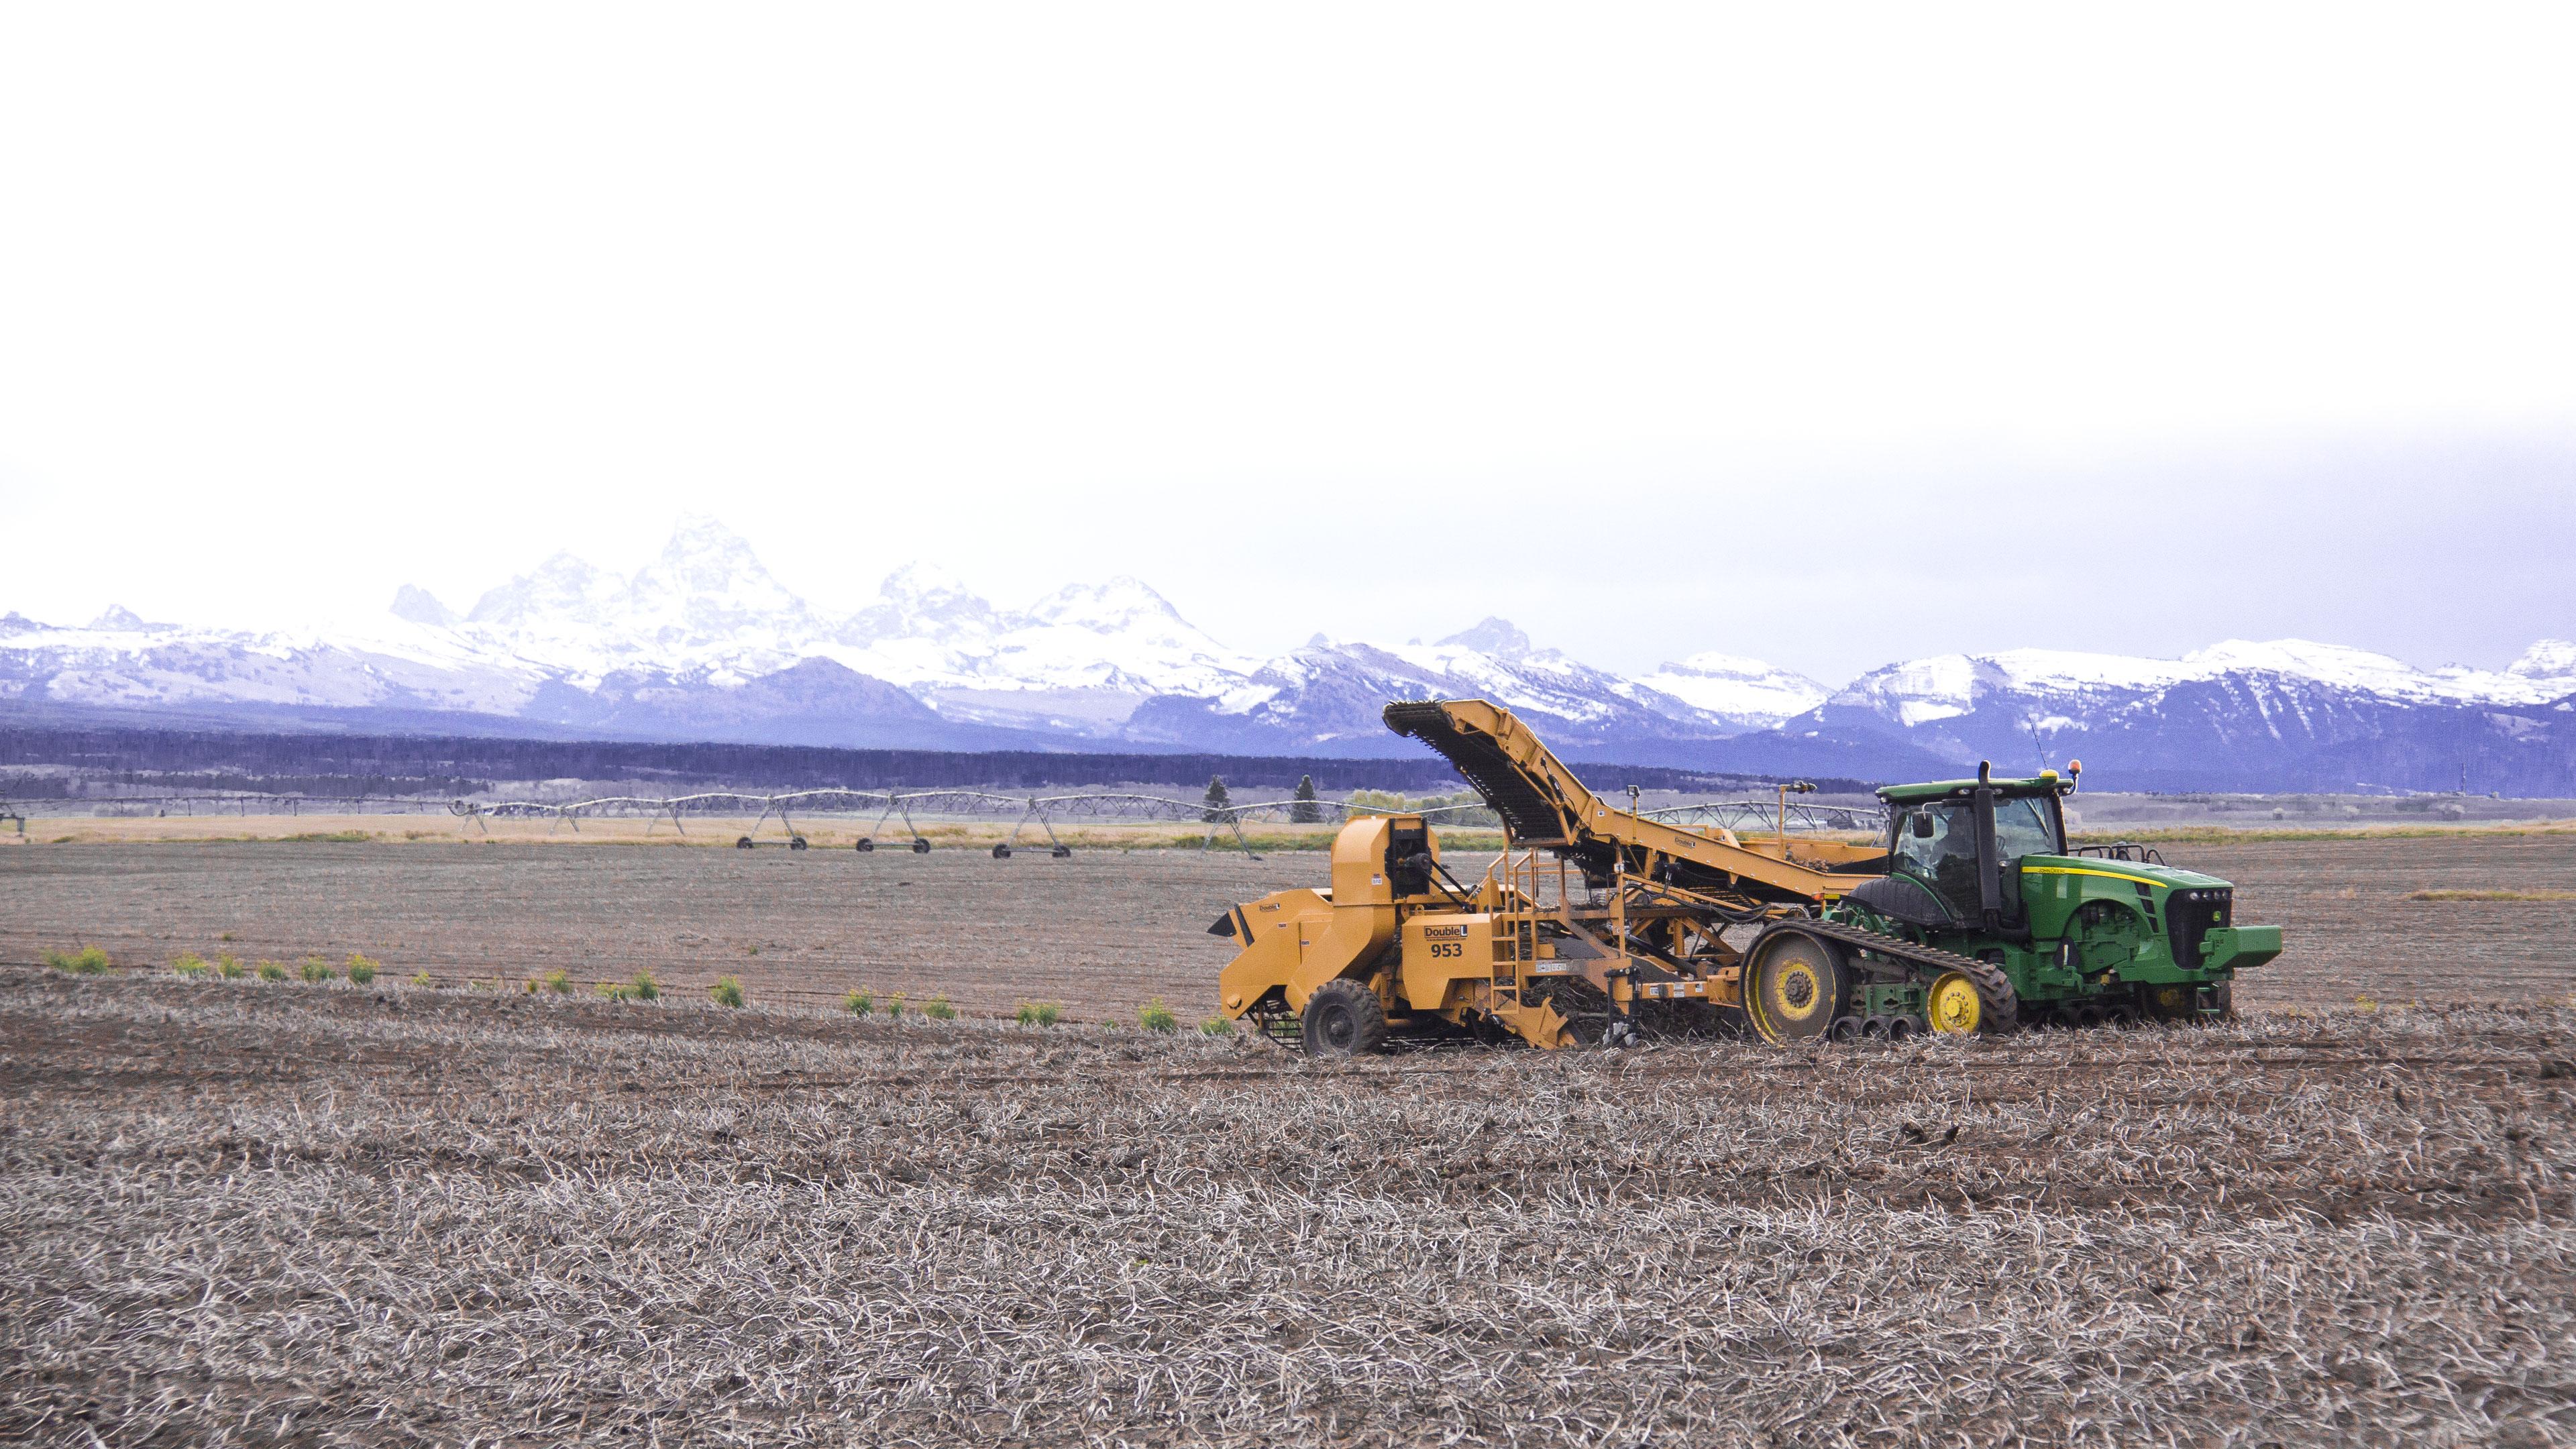 potato harvesting machine